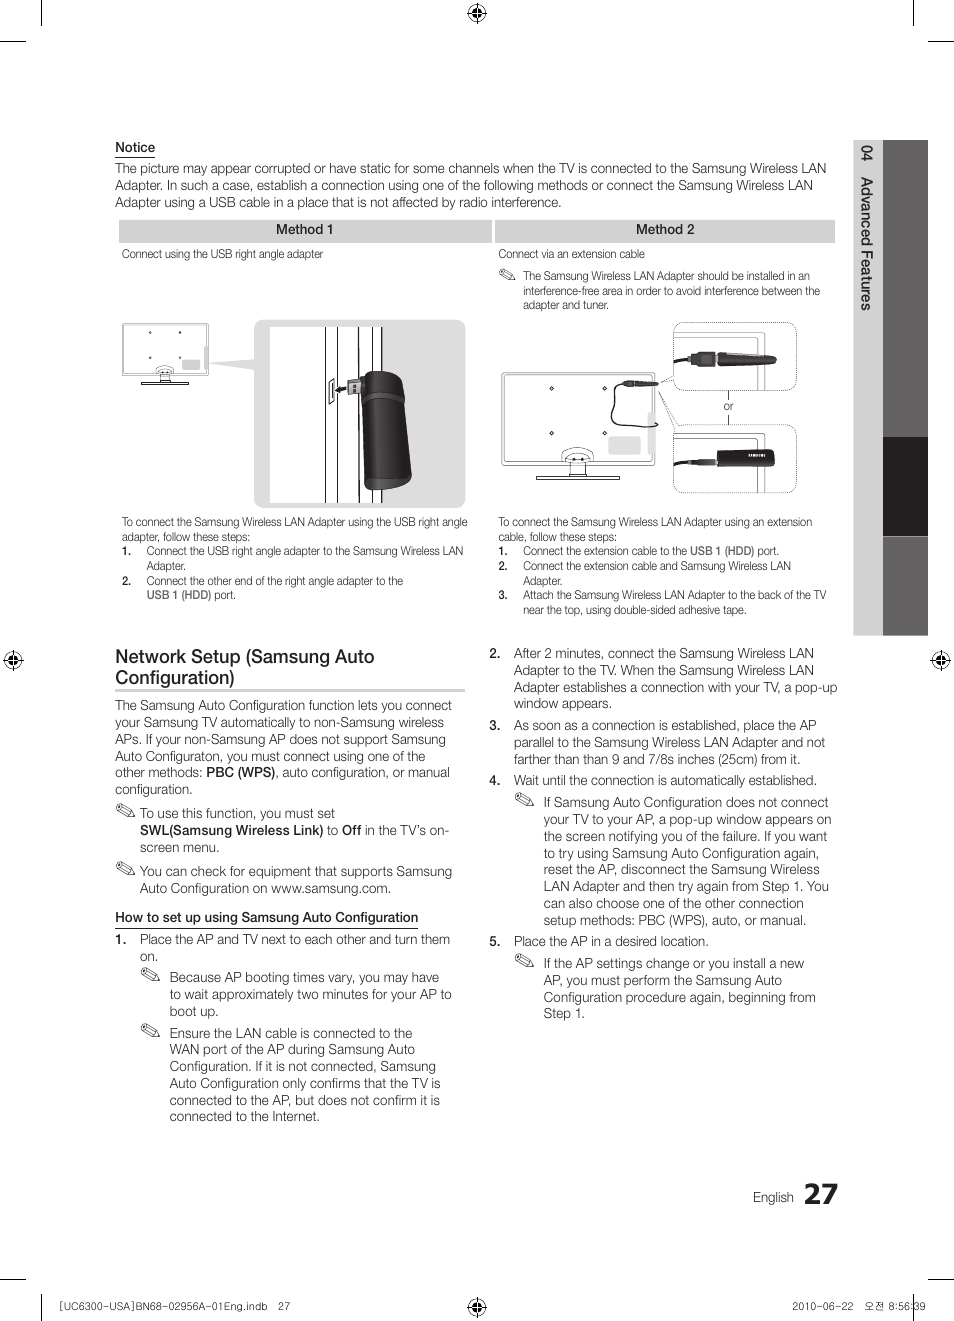 network setup samsung auto configuration samsung 6300 series rh manualsdir com Car GPS Receiver Product Manuals Haynes Automotive Repair Manuals